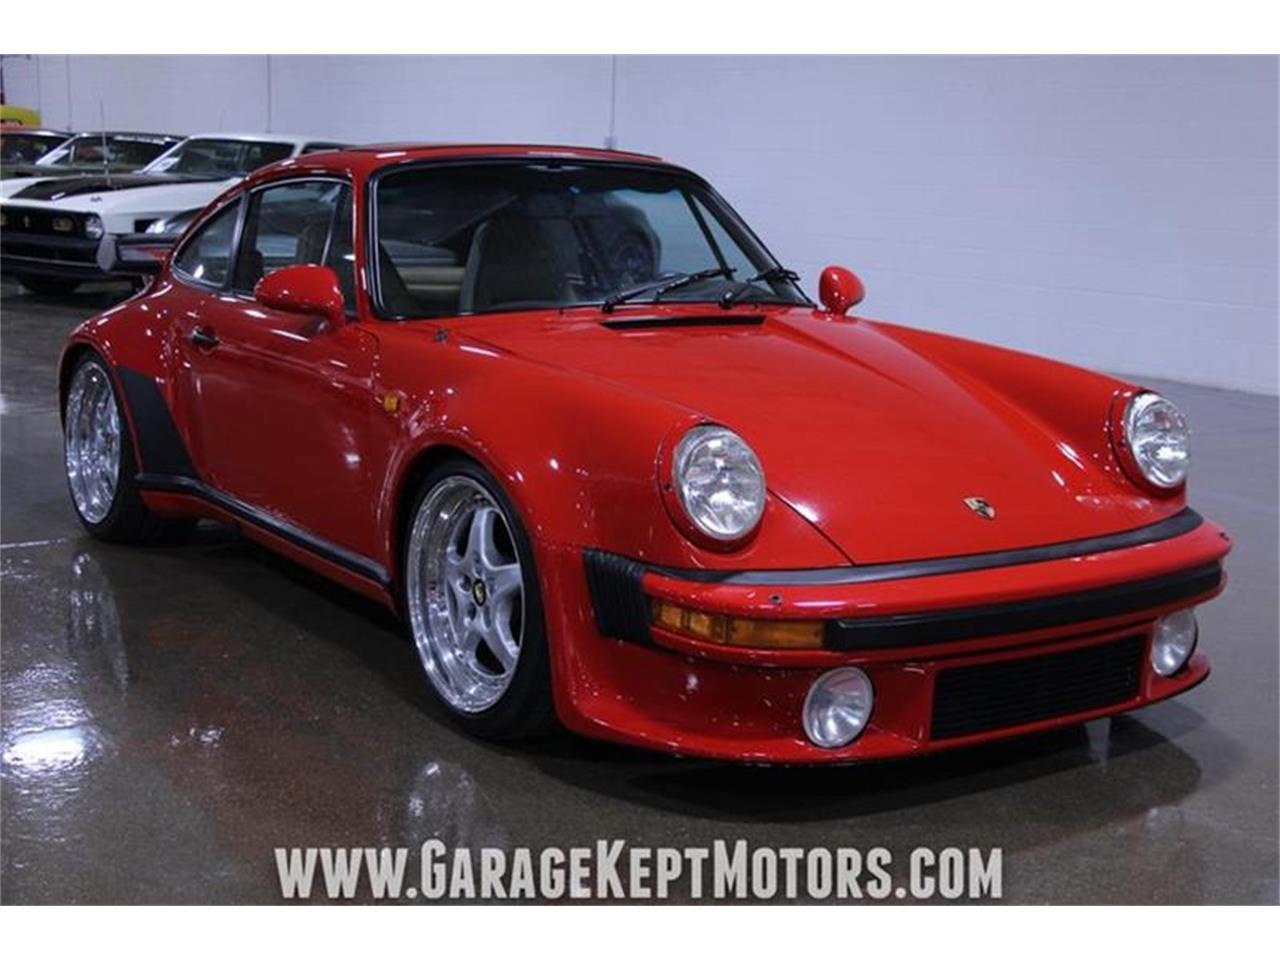 Large Picture of 1982 Porsche 911 located in Grand Rapids Michigan - $109,900.00 - Q470